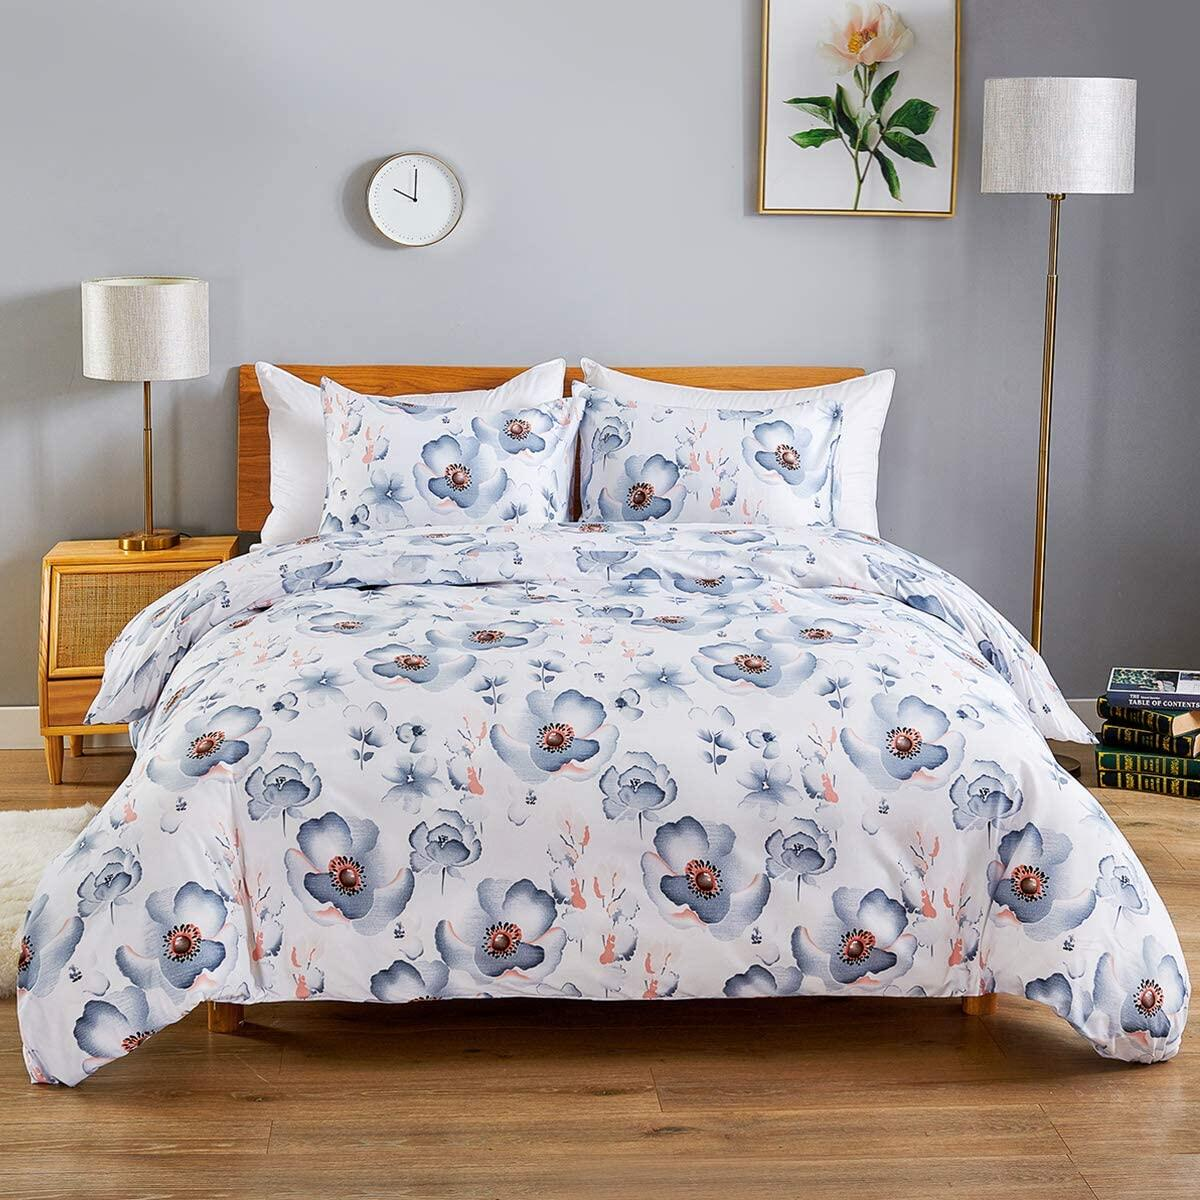 WARMDERN Duvet Cover Set Blue Floral Microfiber Bedding Set Ultra Soft Duvet Cover Set with Zipper Closure & Ties Corner, 3pc 1 Duvet Cover and 2 Pillowcases (Queen, Blue)